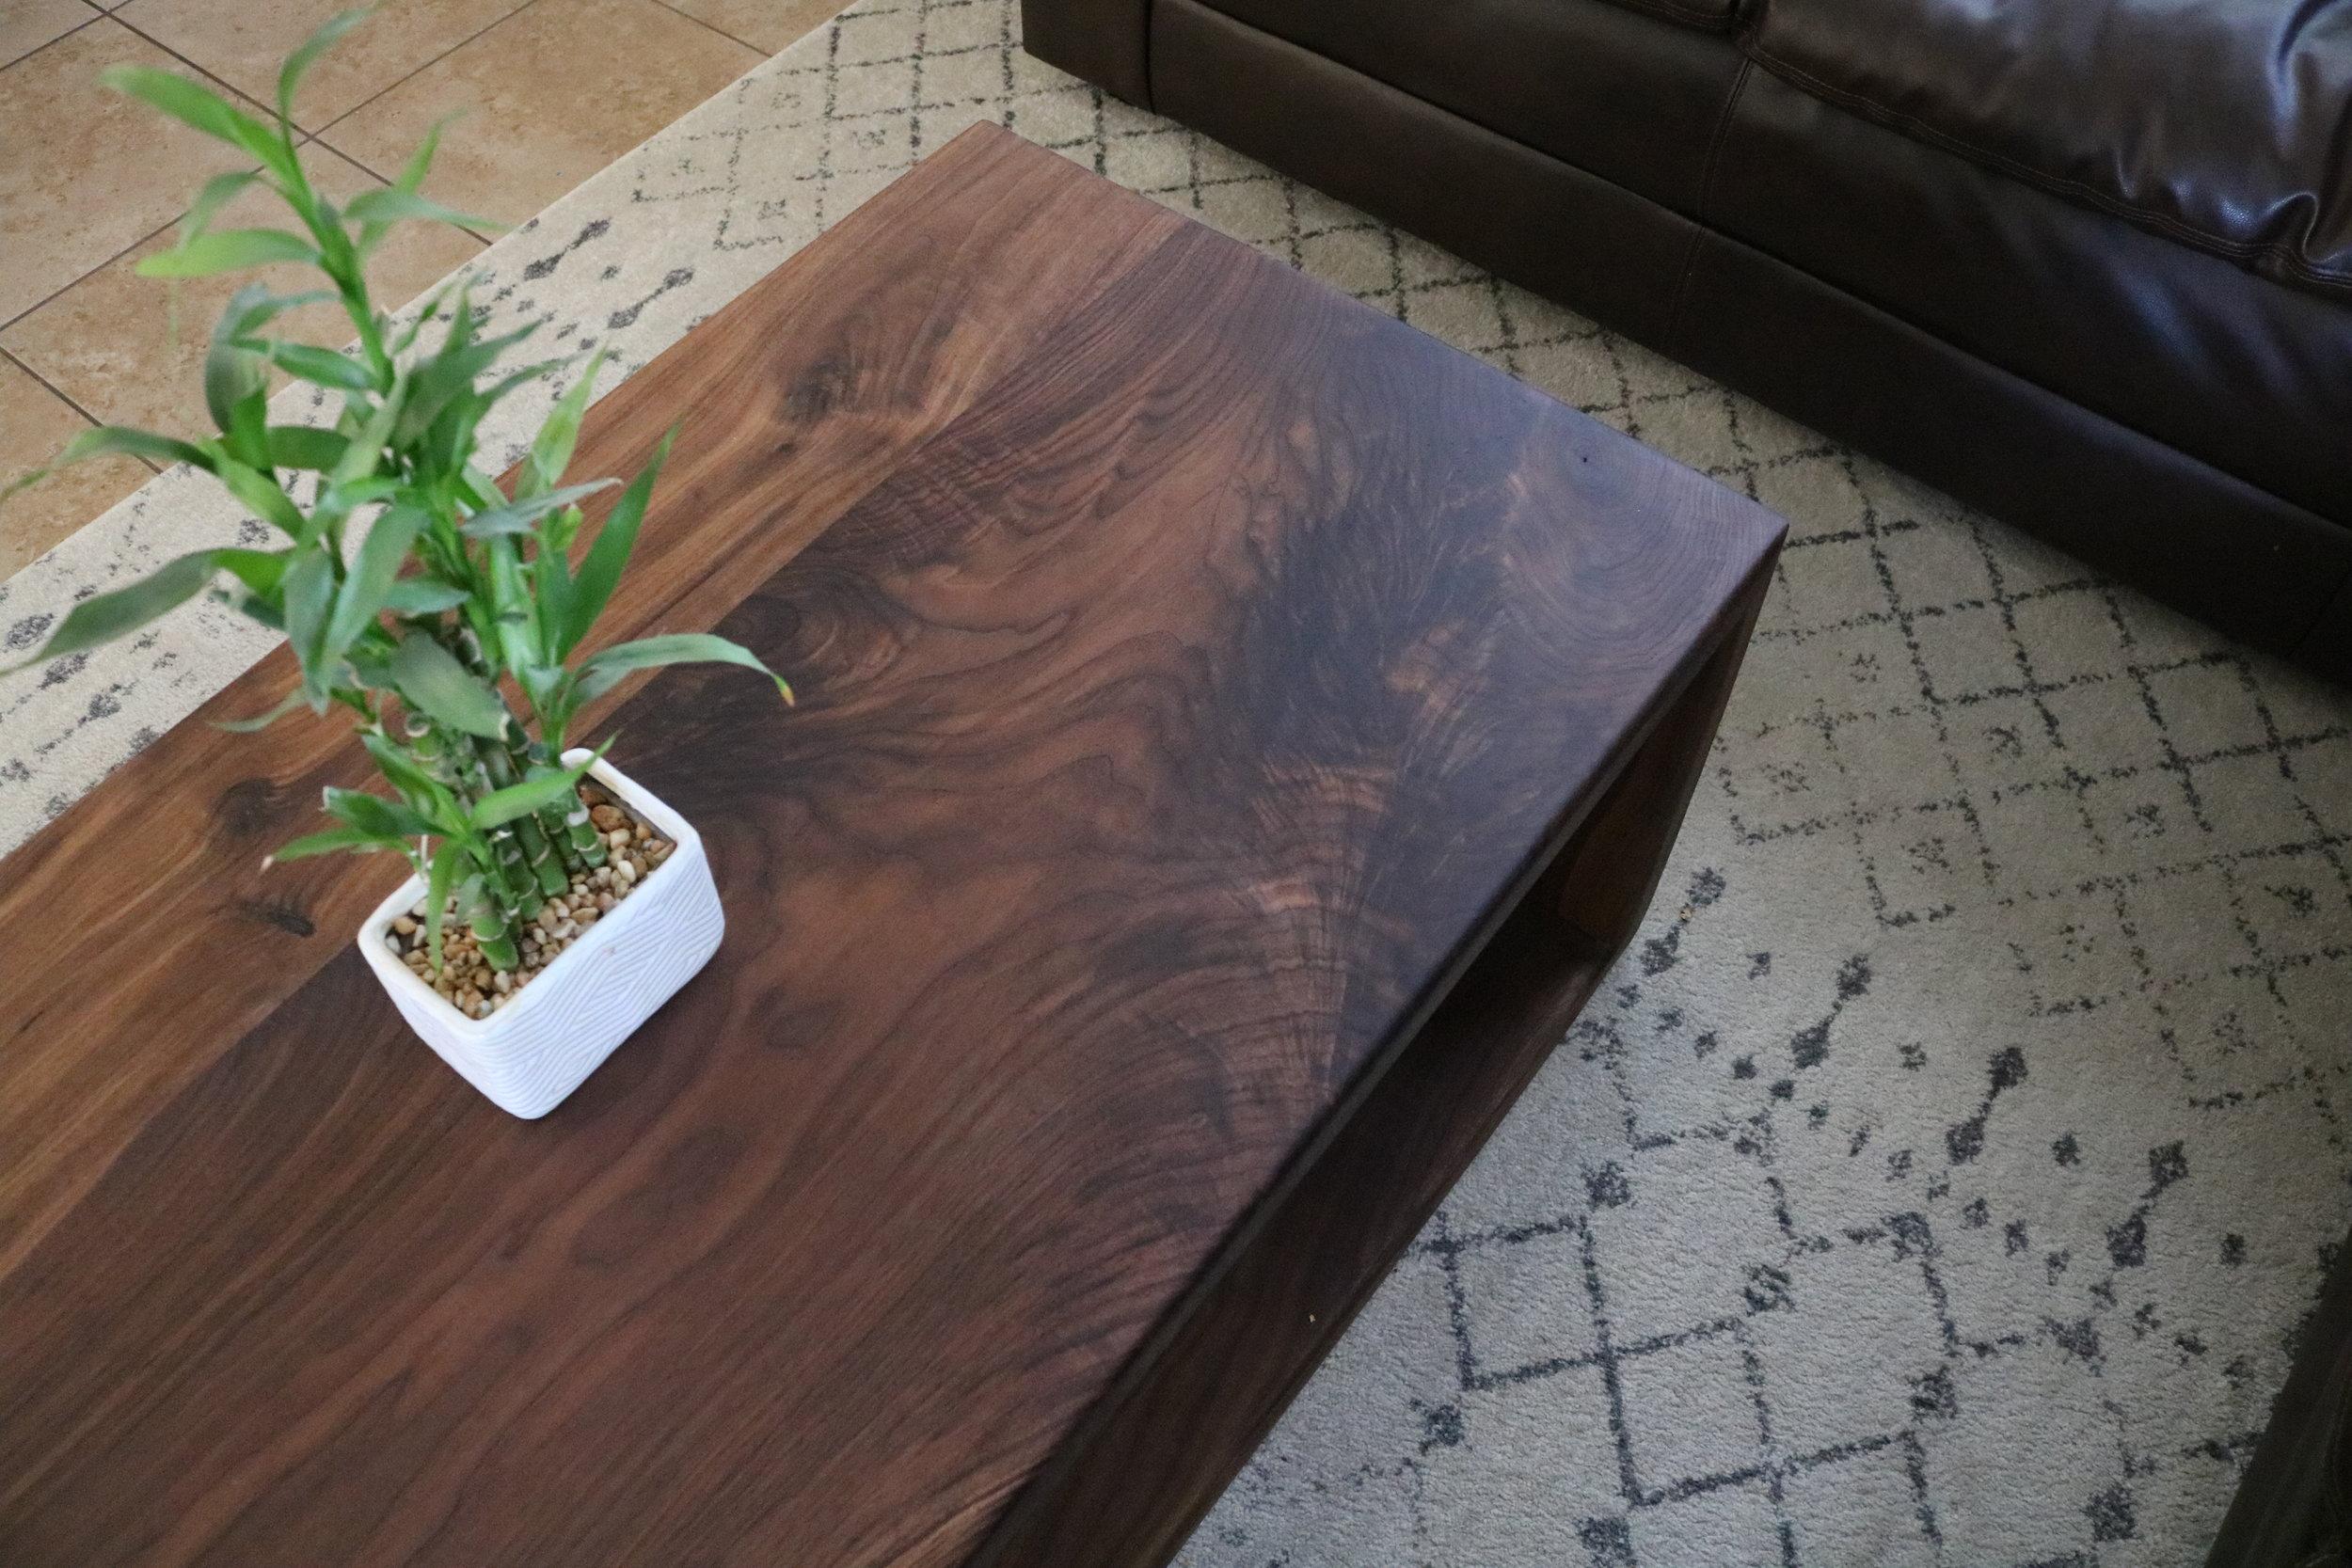 walnut-coffee-table-heart-of-timber.JPG